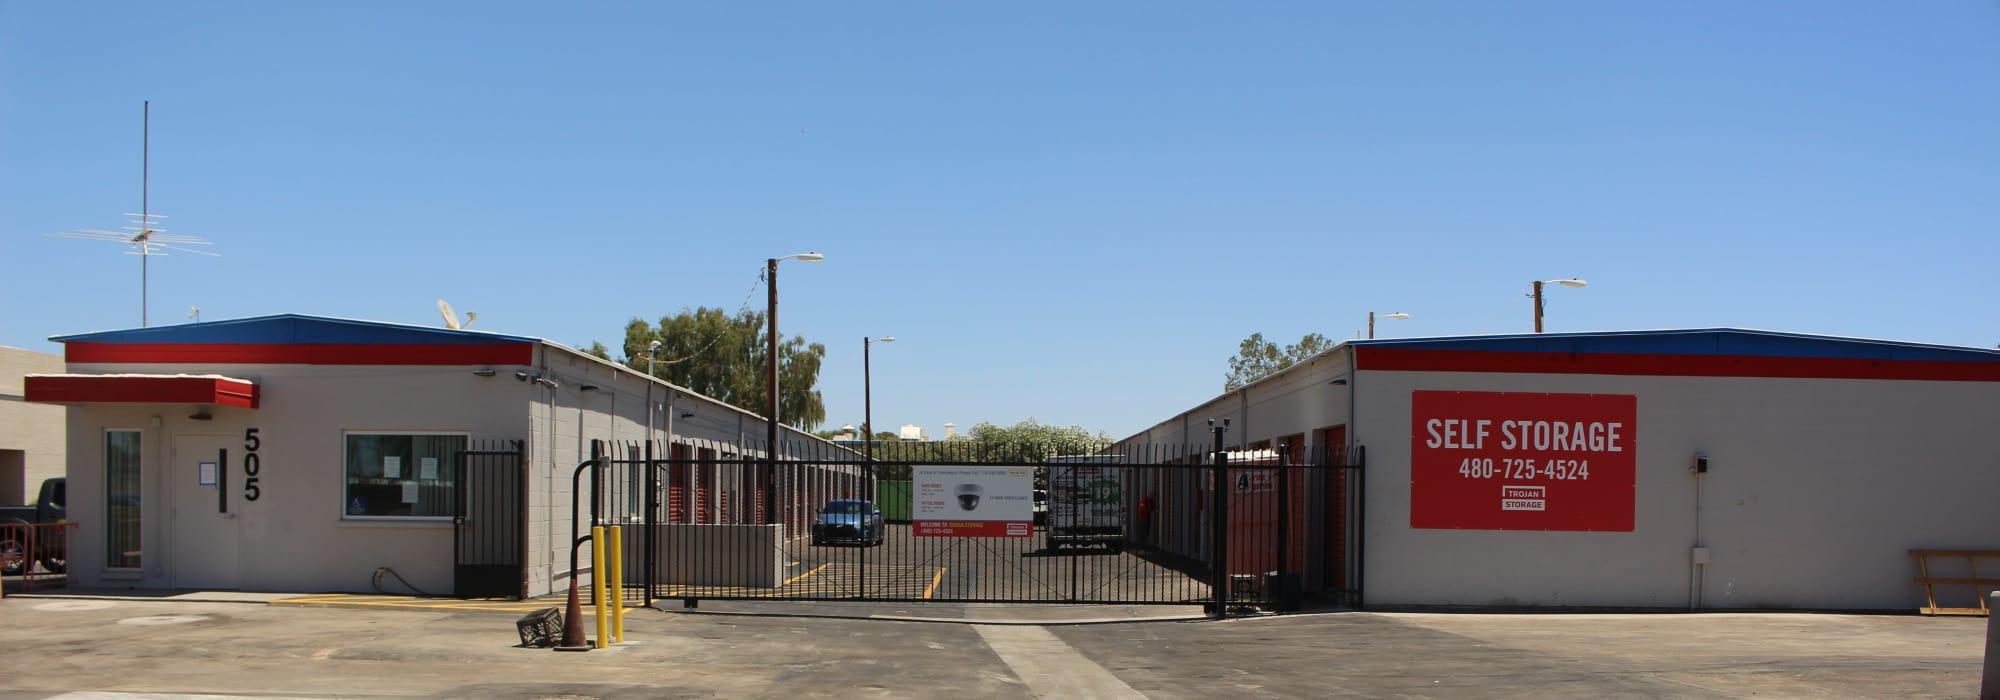 Self storage at Trojan Storage in Tempe Arizona